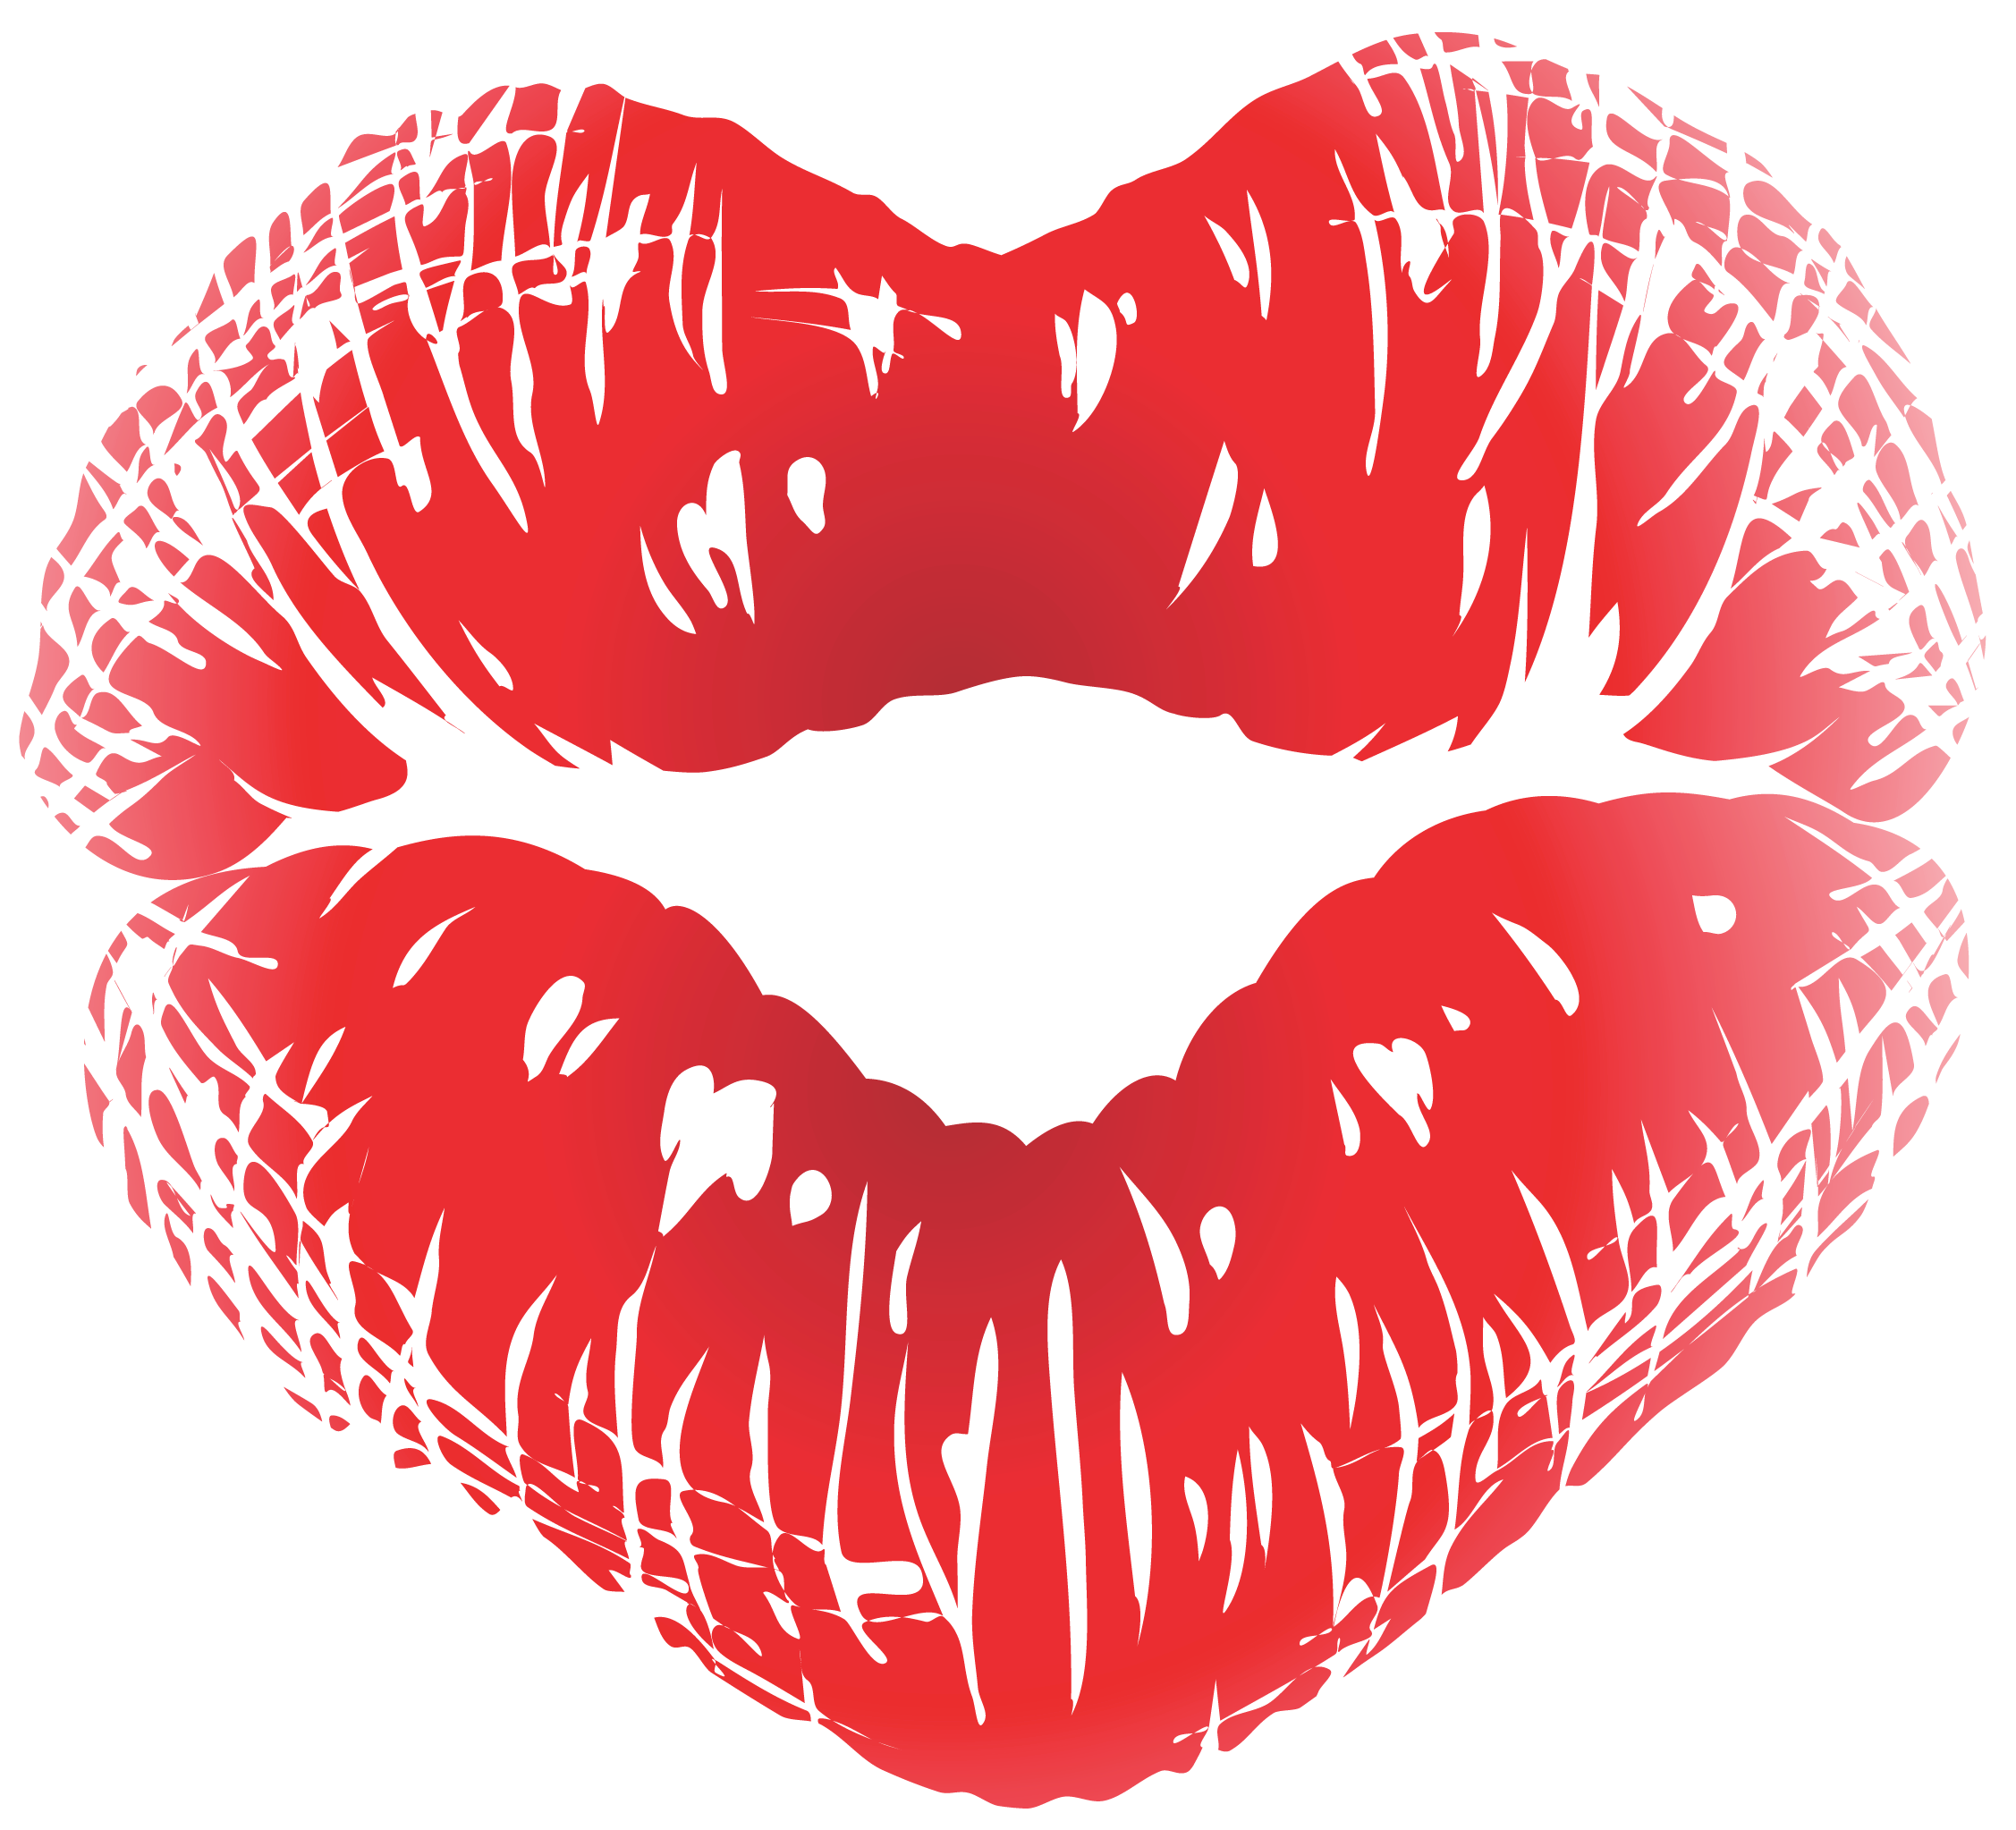 Lipstick clipart kiss me Clip Cliparting art free download